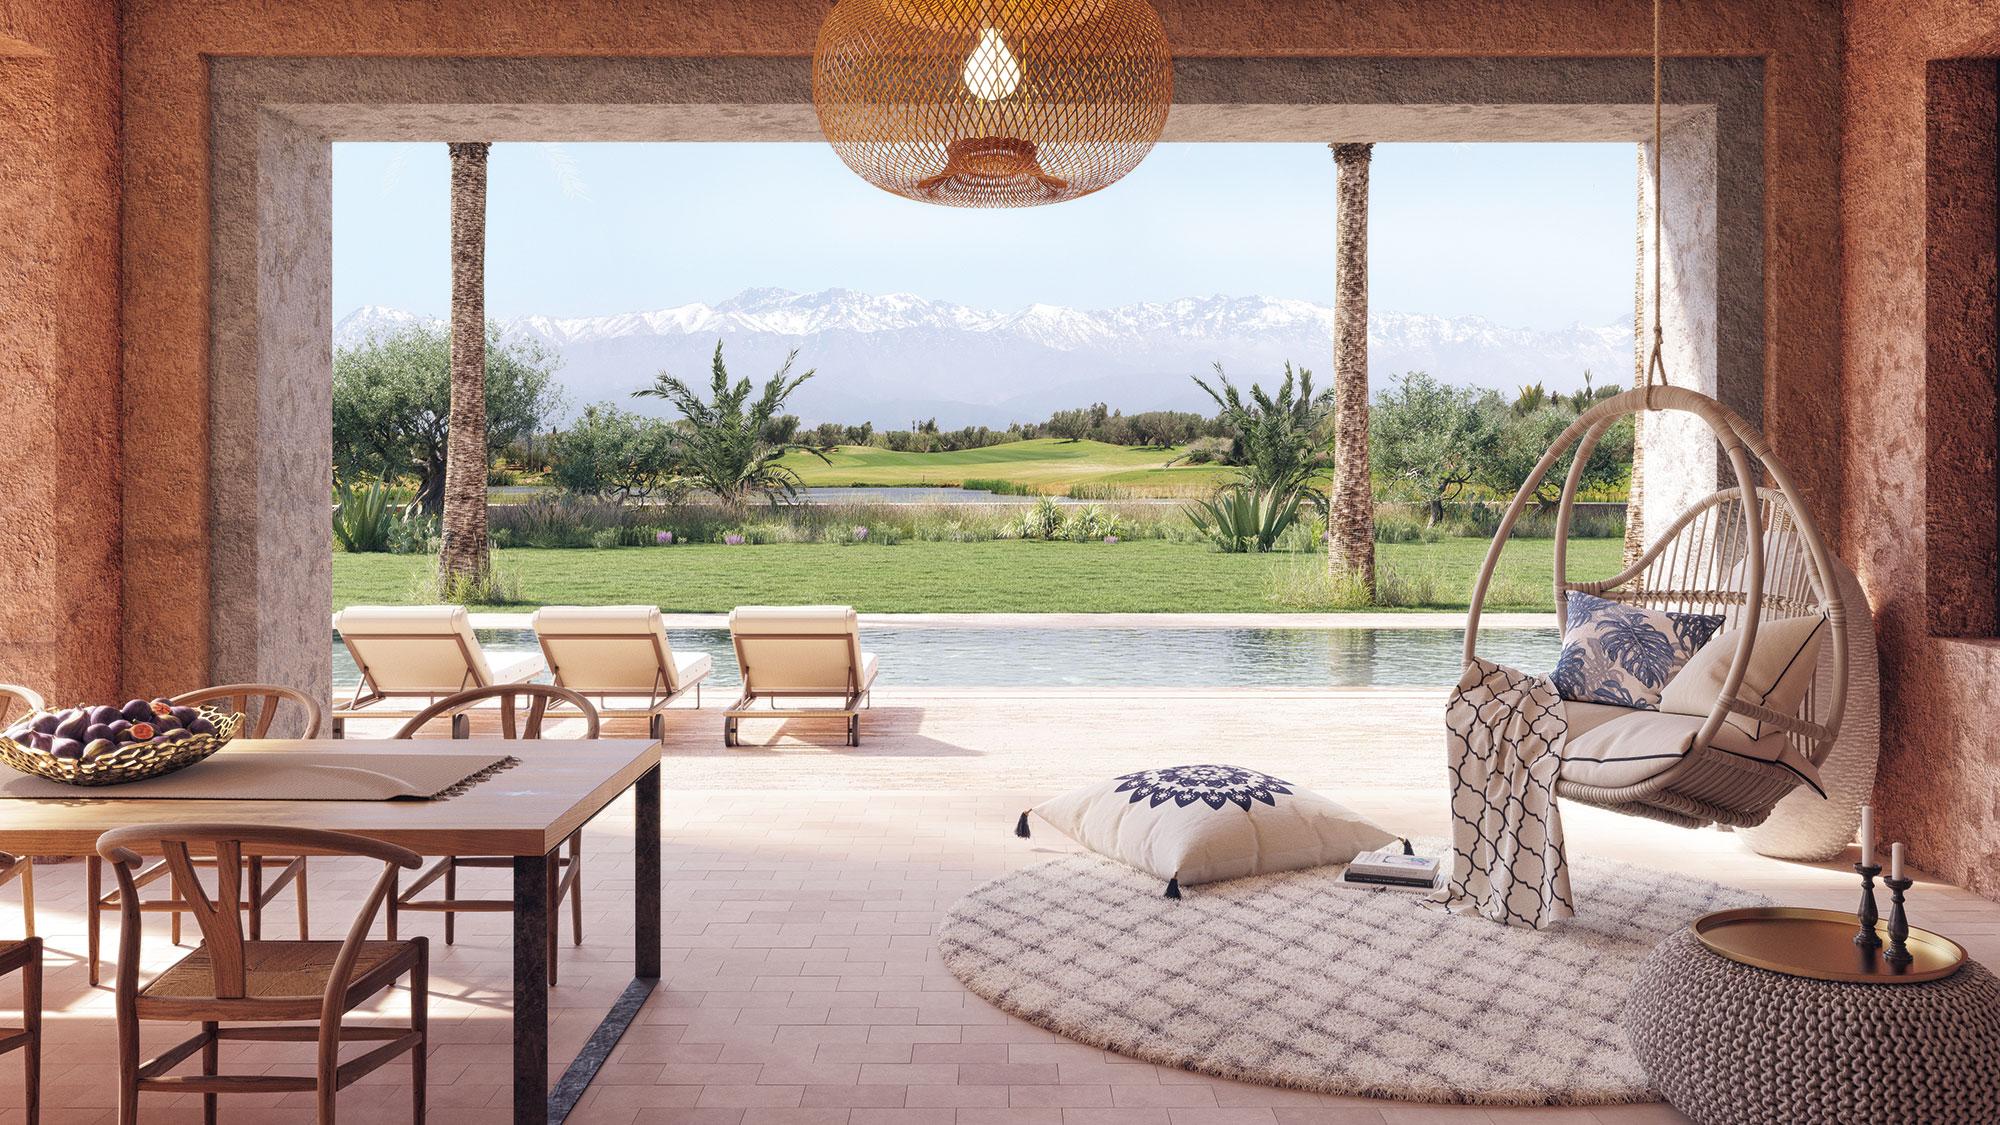 vacation rental booking platform